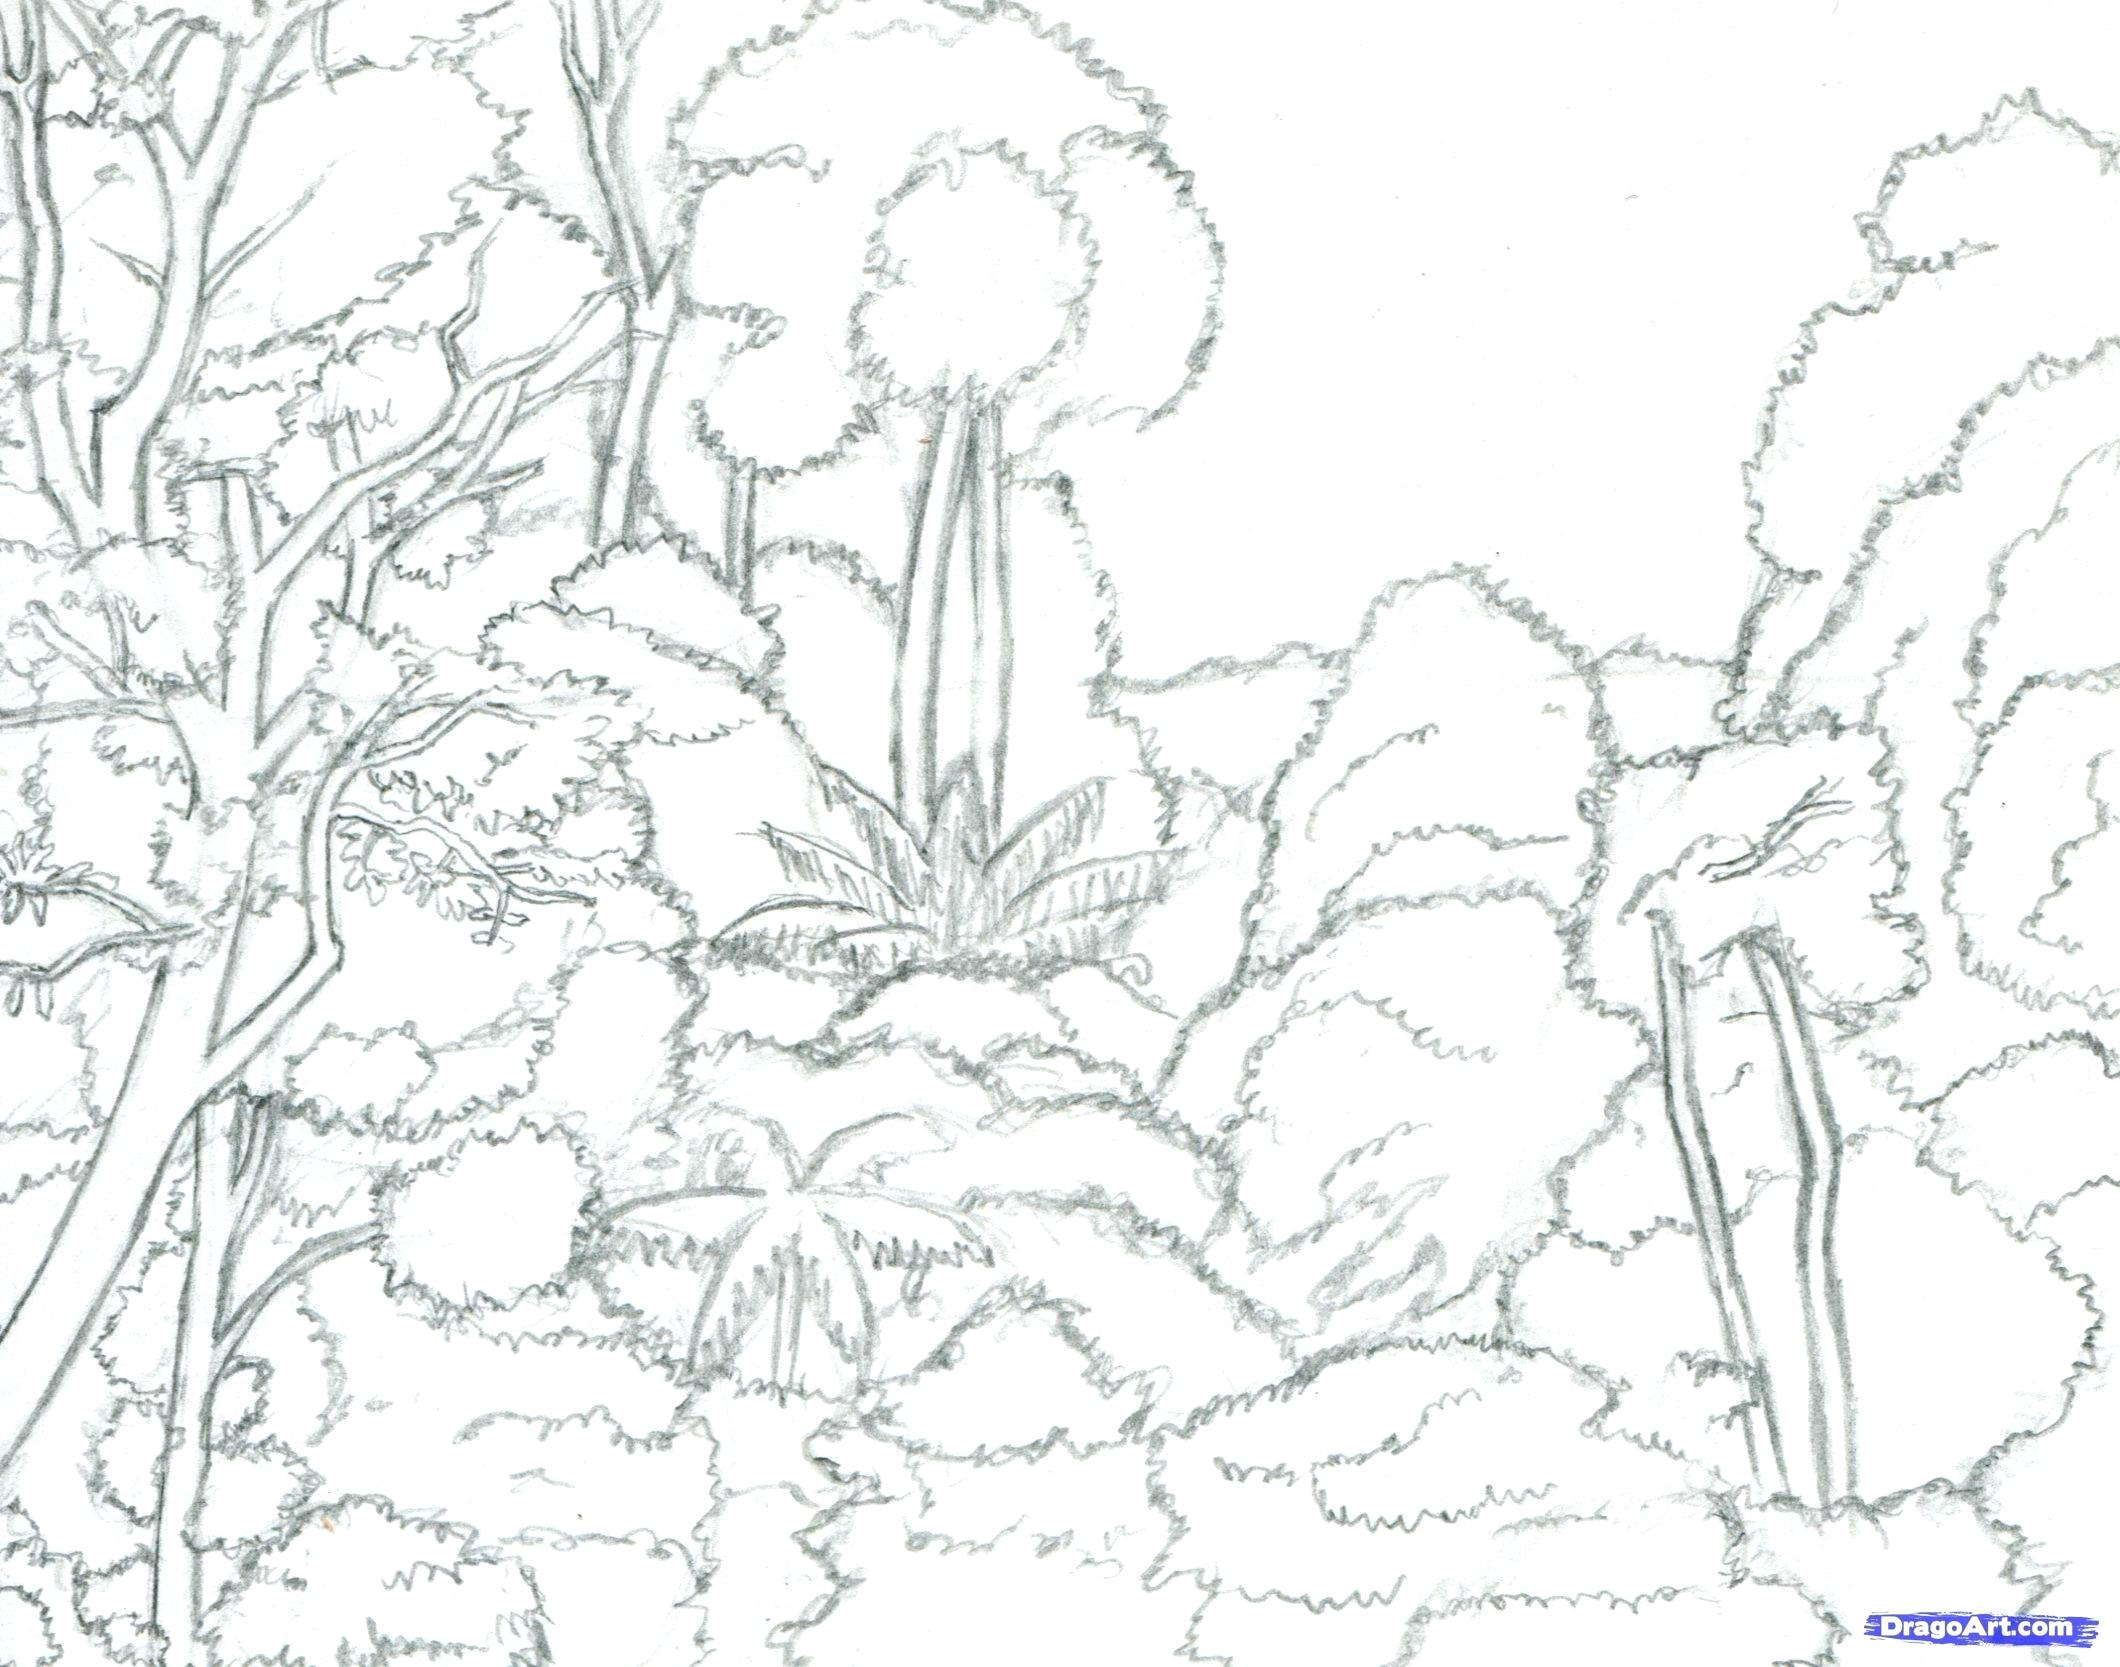 2120x1667 Diagram Tropical Rainforest Layers Diagram Plants Drawings